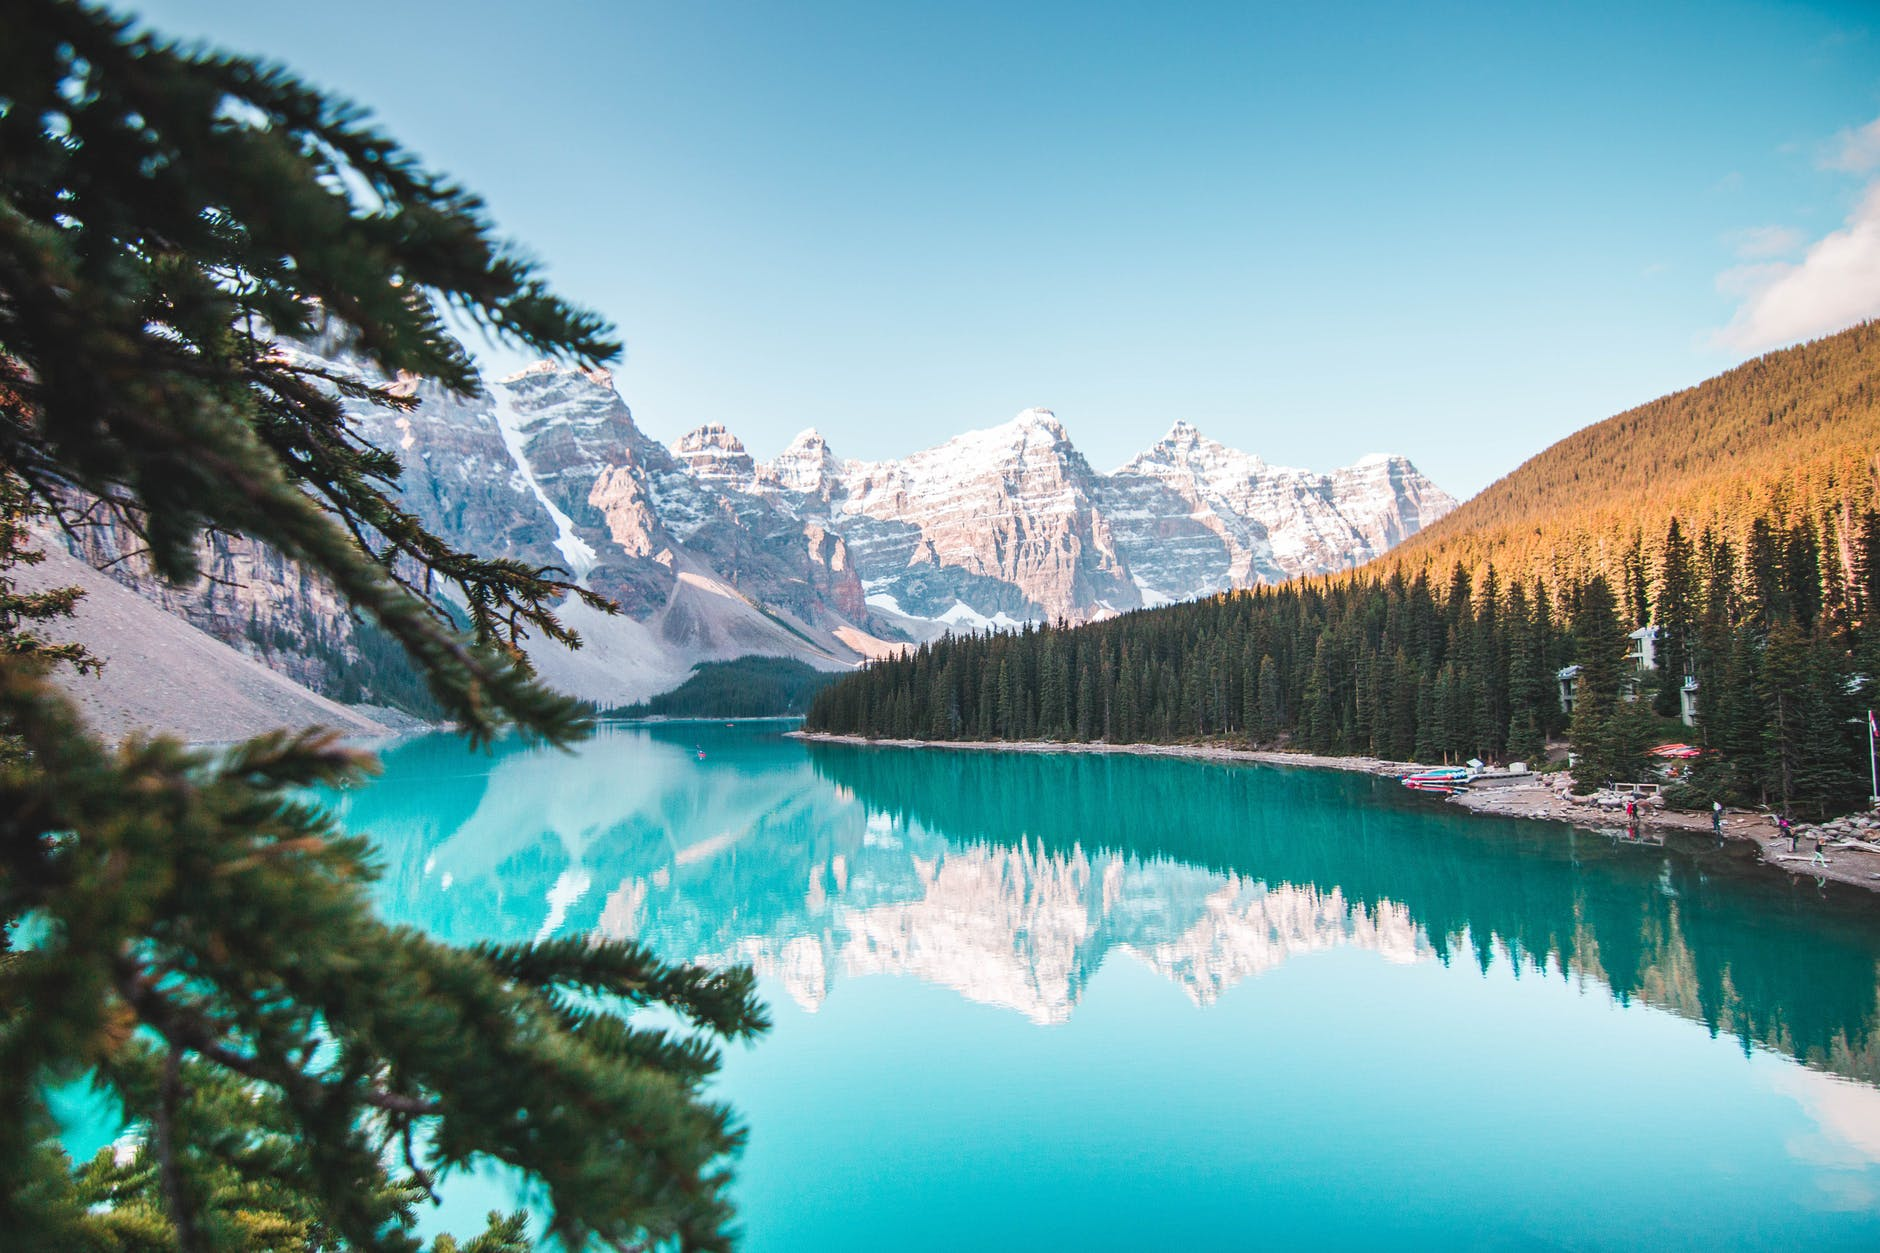 beautiful view of moraine lake